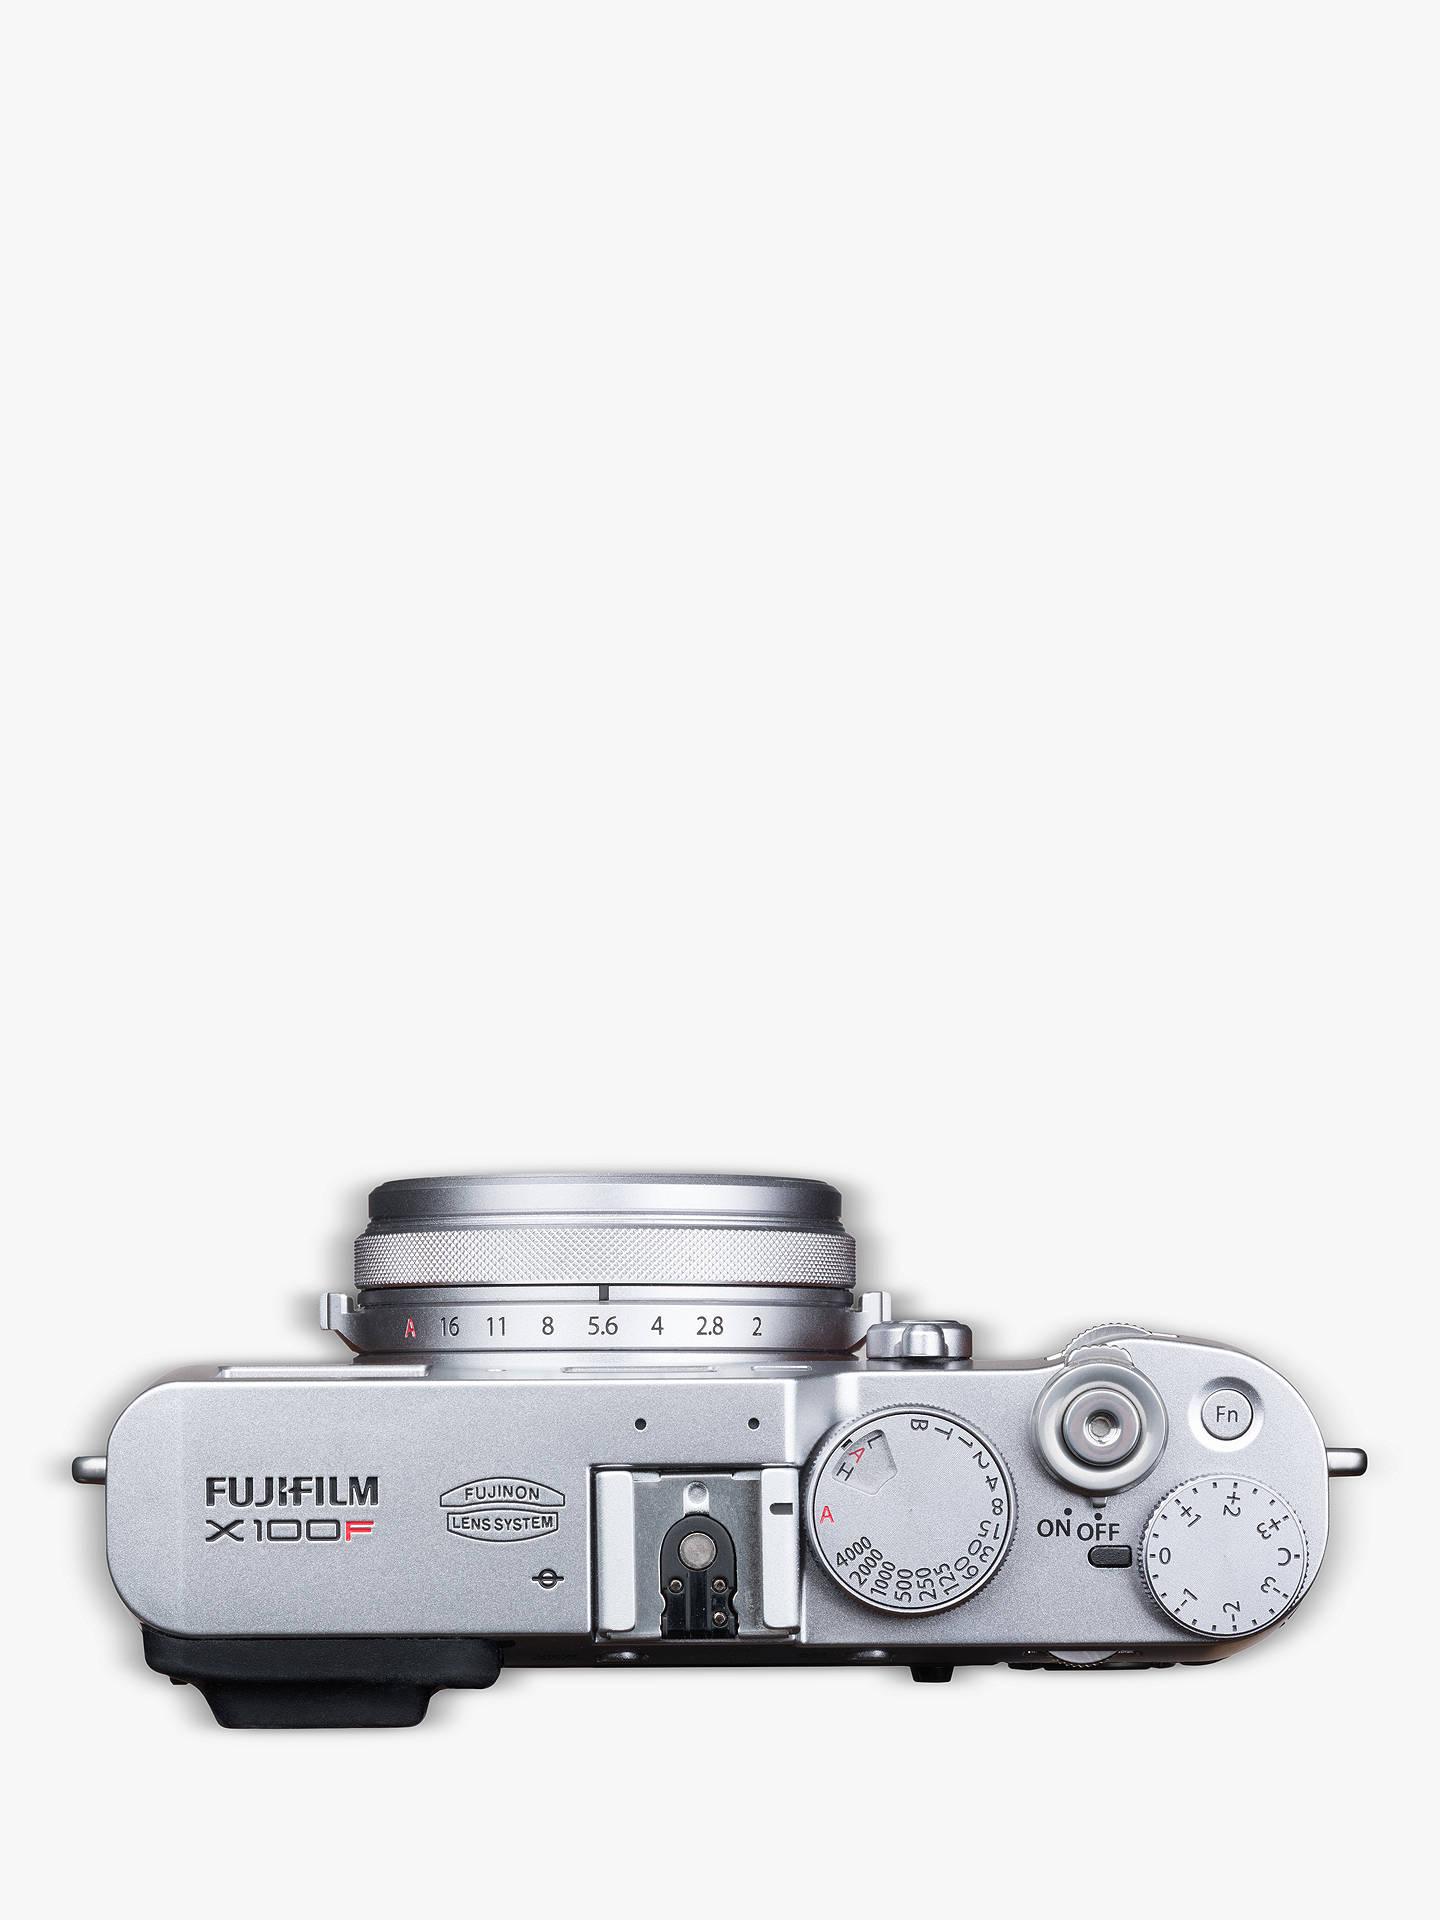 Fujifilm X100F Digital Compact Camera with 23mm Lens, 1080p Full HD,  24 3MP, Wi-Fi, Hybrid EVF/OVF, 3